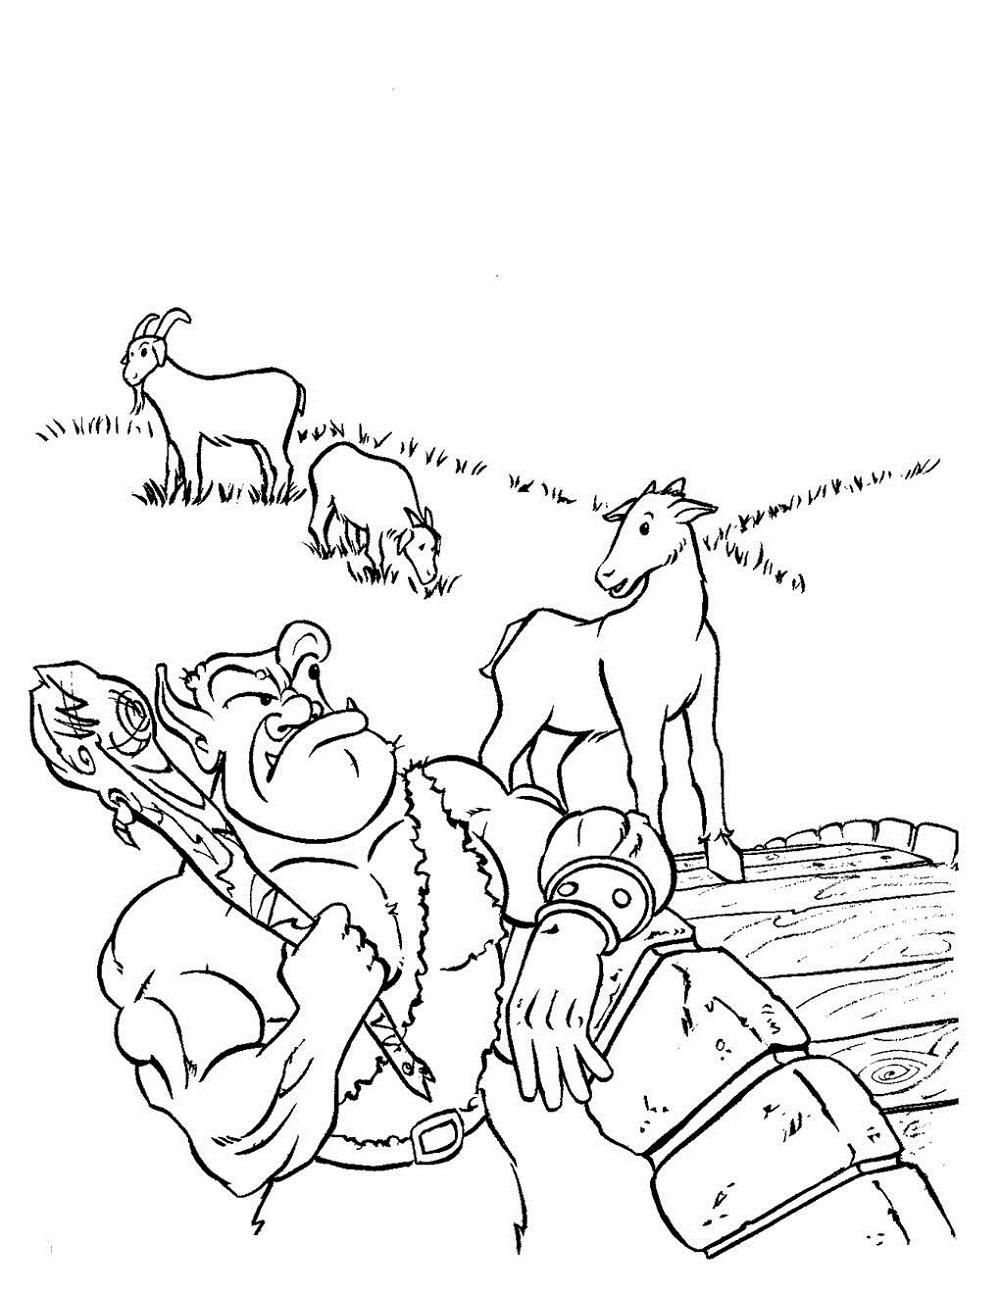 fun three billy goats gruff activities